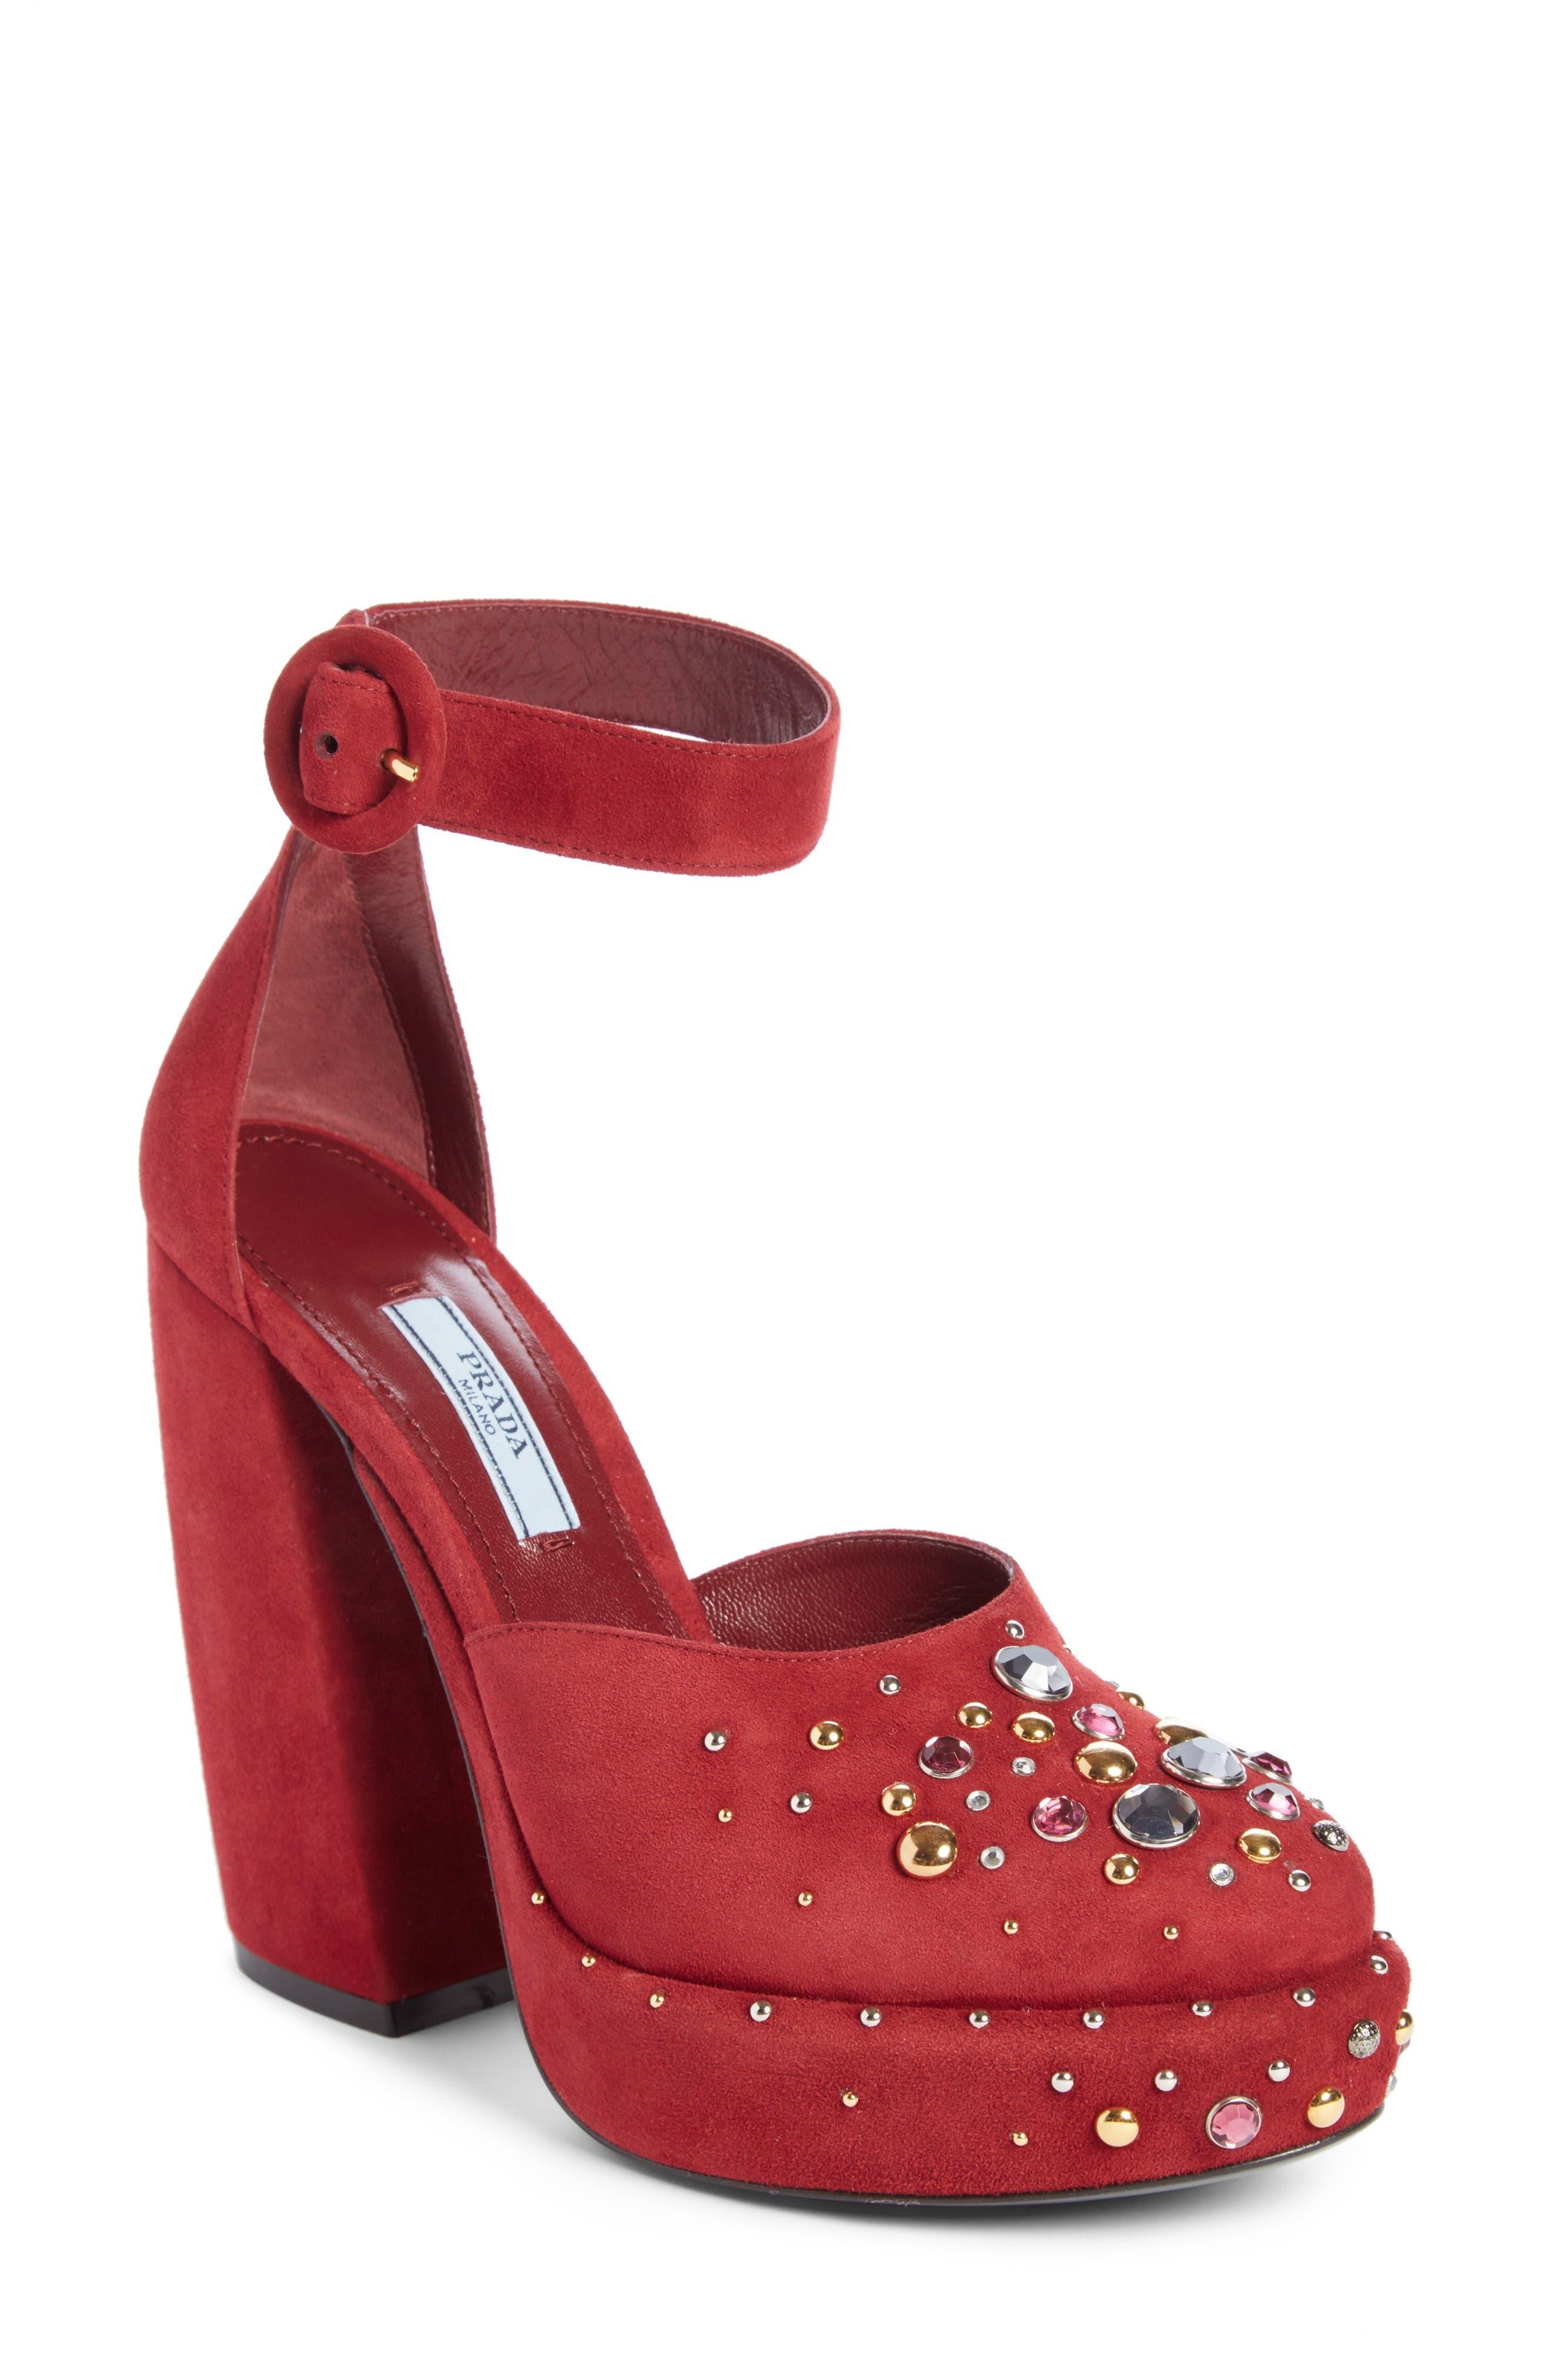 Main Image - Prada Embellished Ankle Strap Pump (Women)